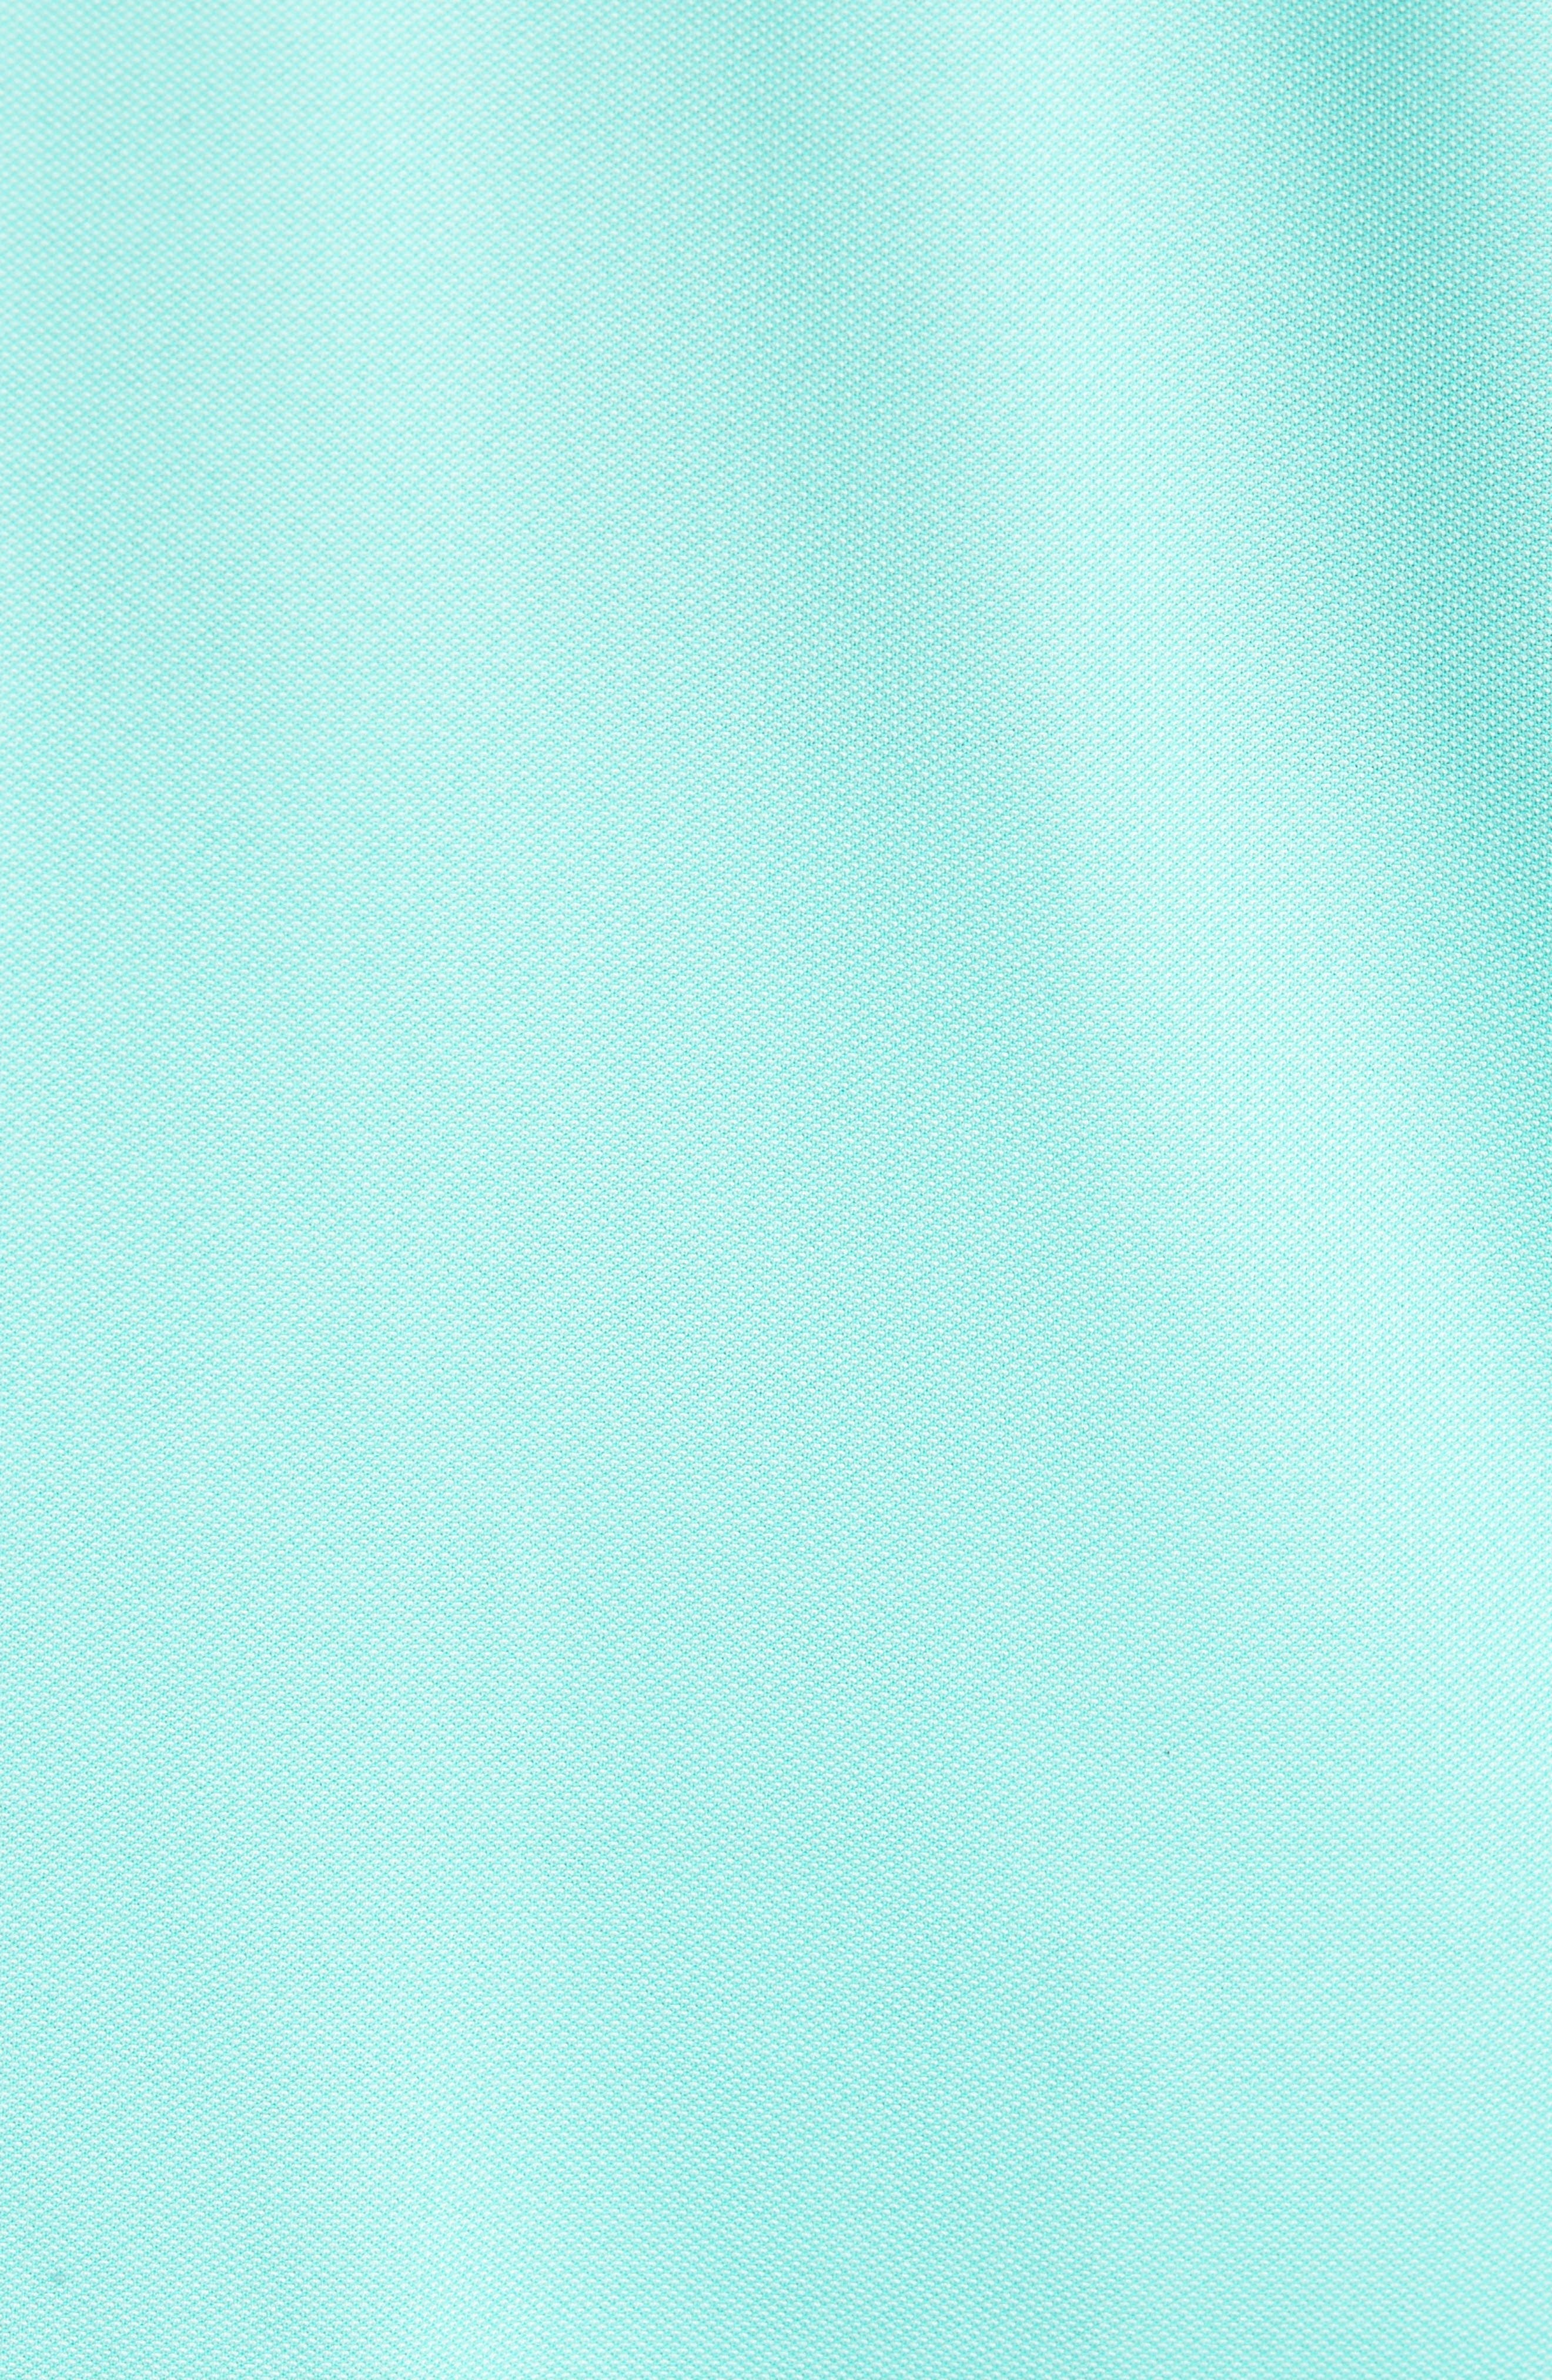 'Blaine Oxford' Moisture Wicking Dry Tec Polo,                             Alternate thumbnail 5, color,                             337